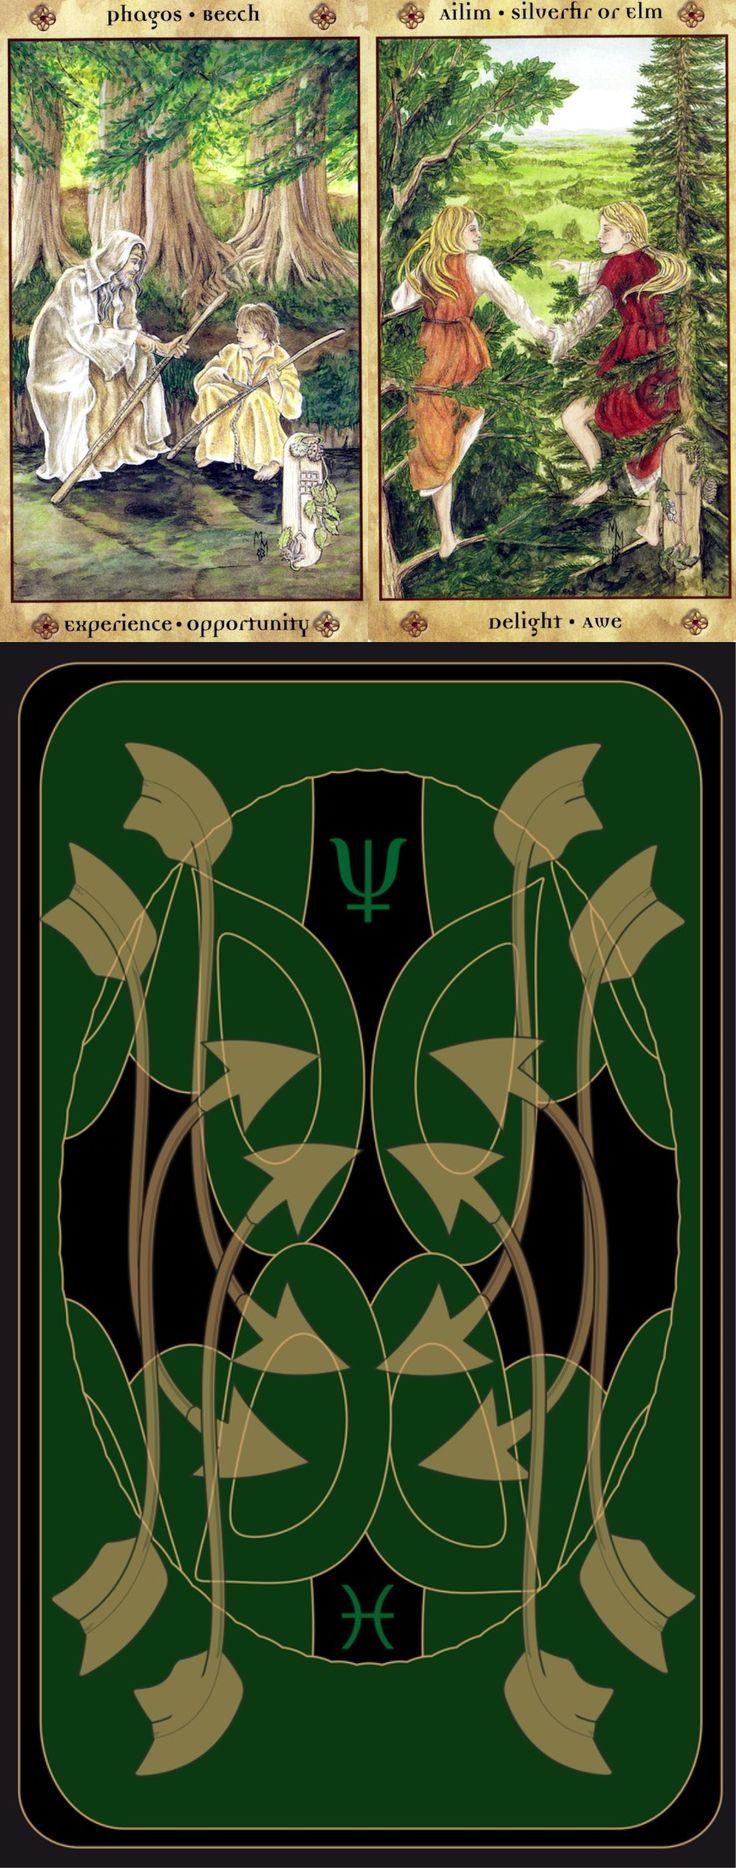 psychic, divination movie online and tarot avenir gratuit, what is divination and legen.